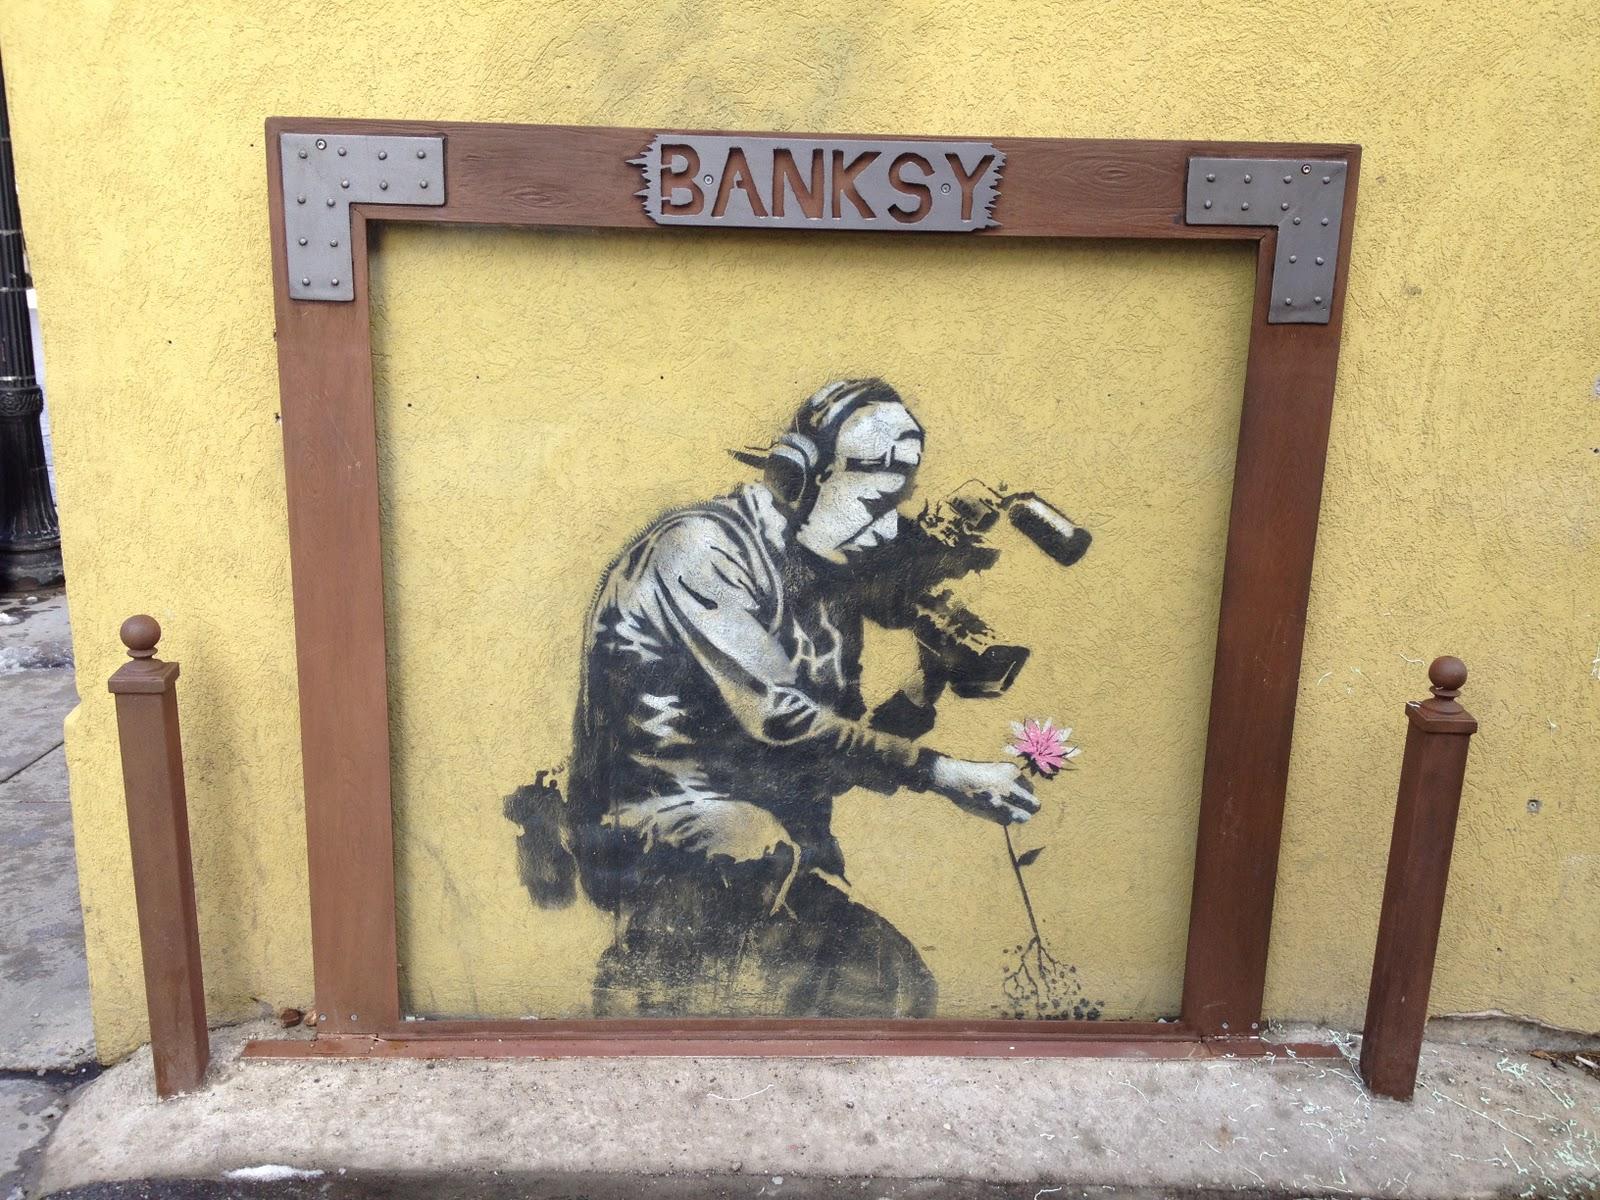 Banksy Park City Sundance Our Kitchen Sink